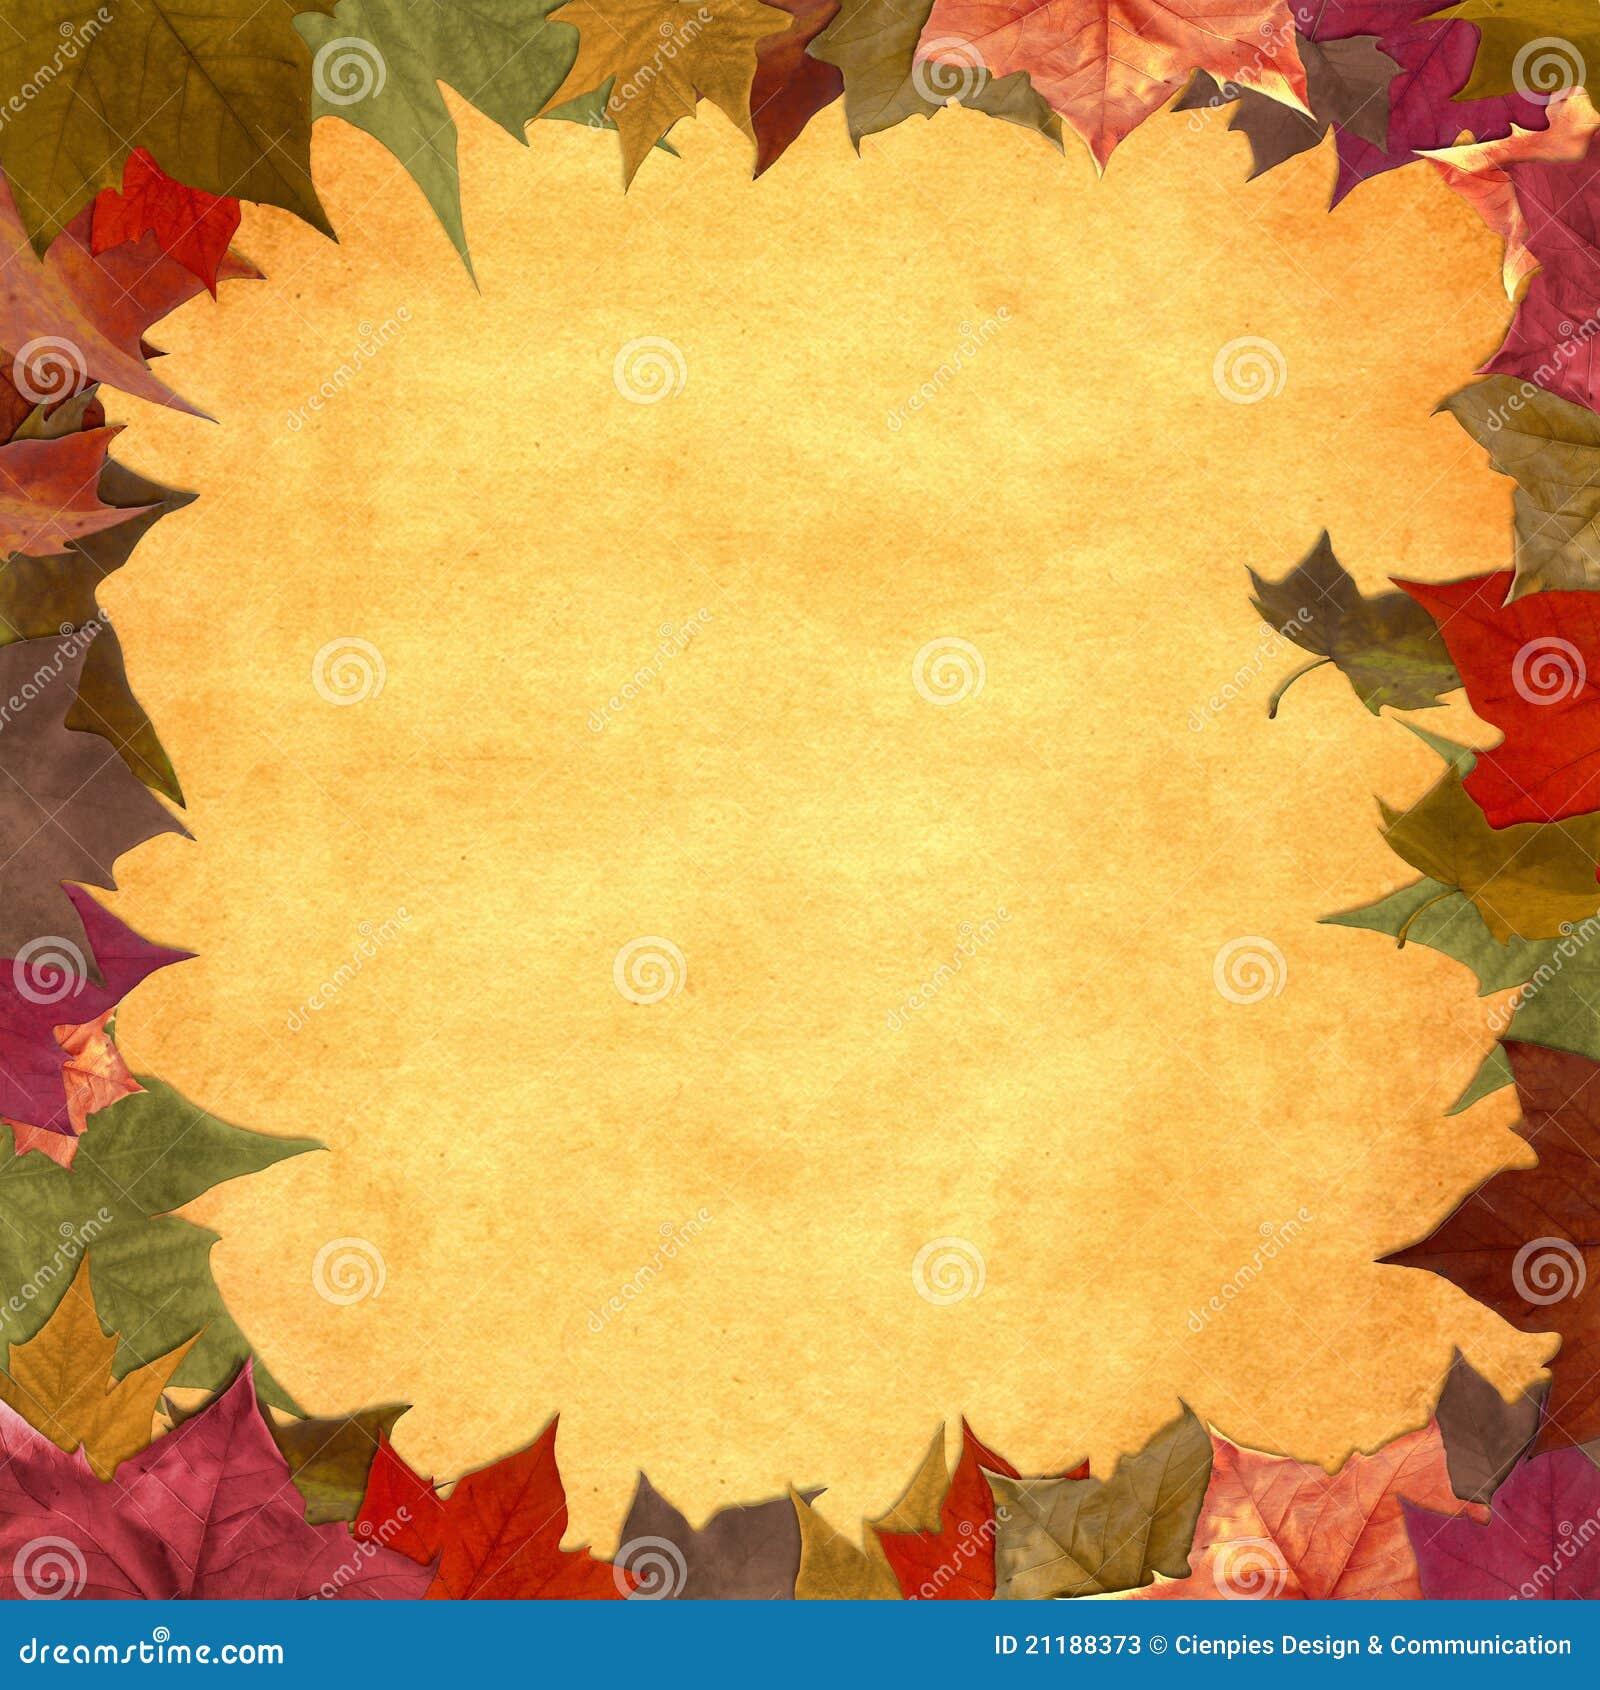 Autumn leaves grunge frame background